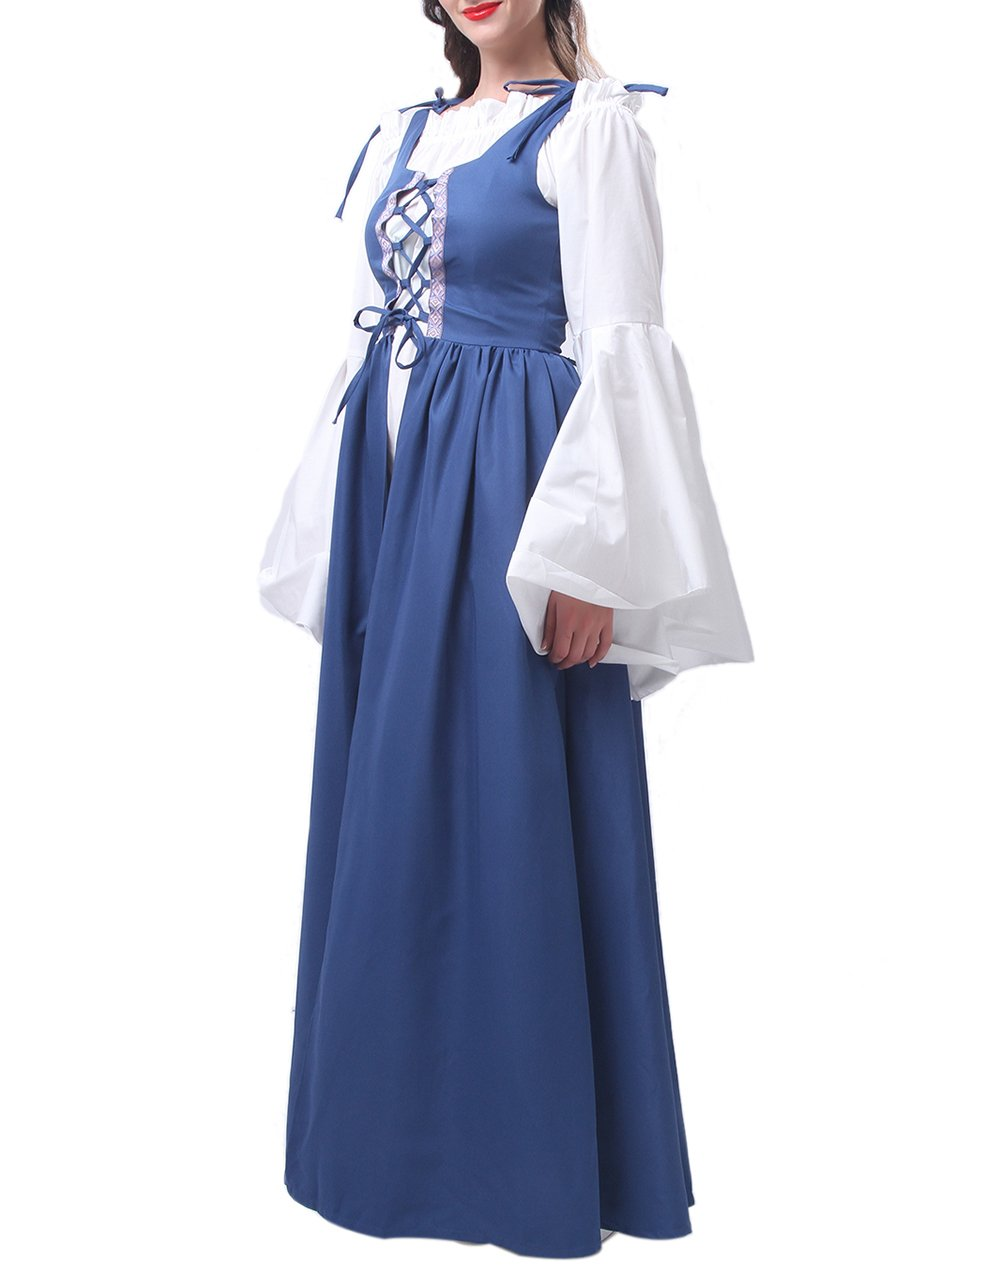 ROLECOS Womens Renaissance Medieval Irish Costume Boho Underdress Overdress Coat Light Blue L by ROLECOS (Image #4)